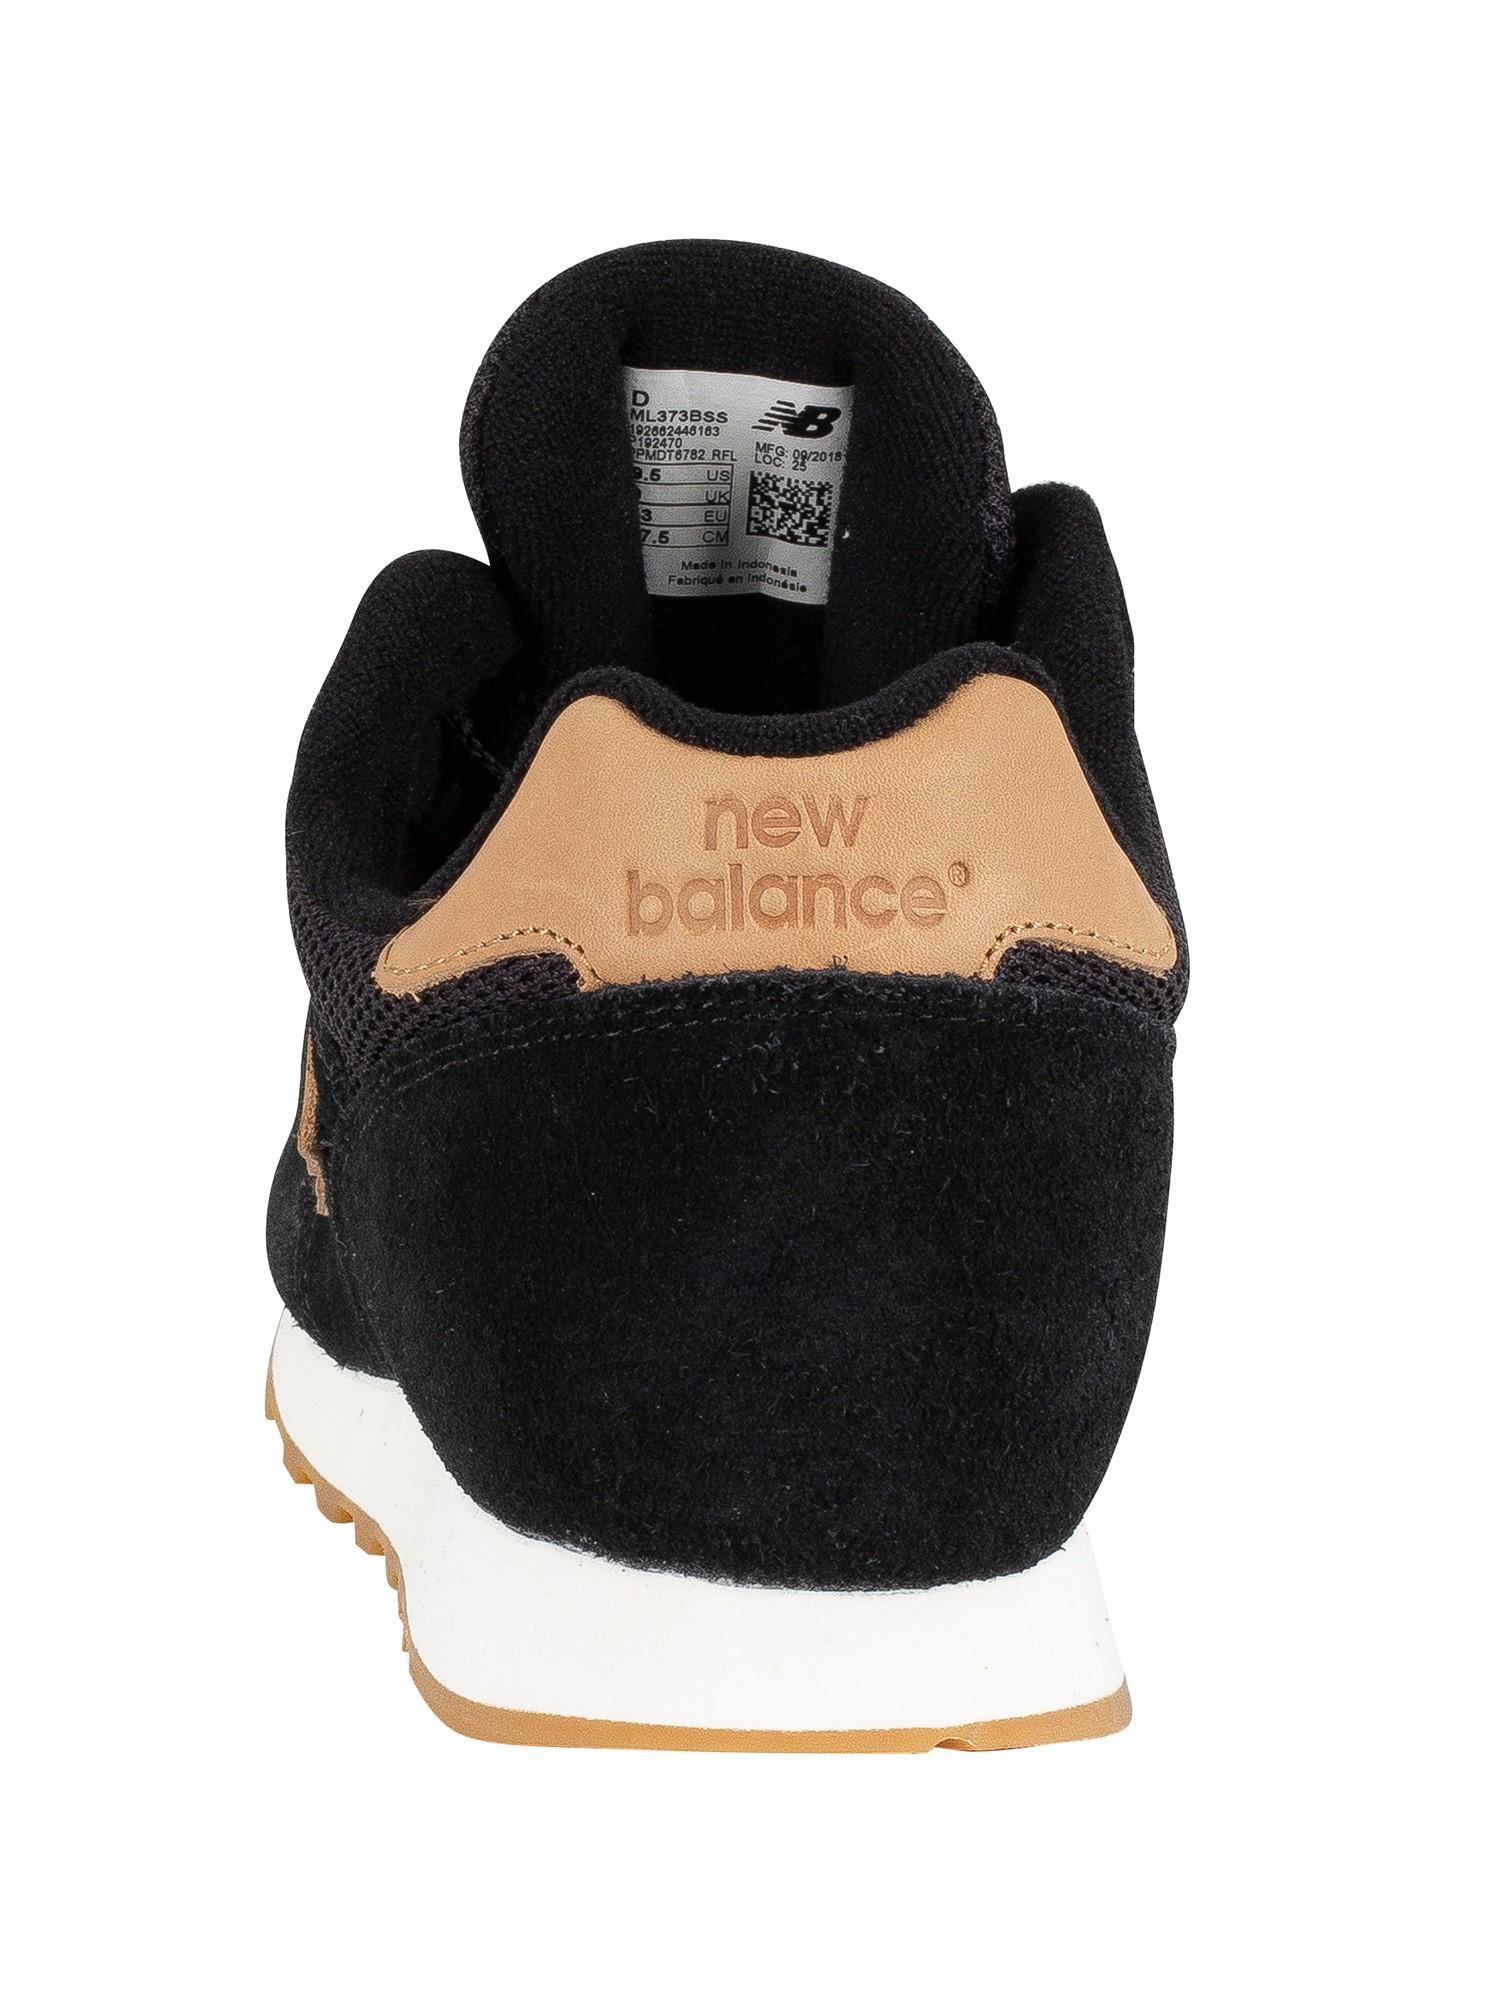 wholesale dealer 6b163 0fb1c New Balance 373 Suede Trainers - Black/Tan